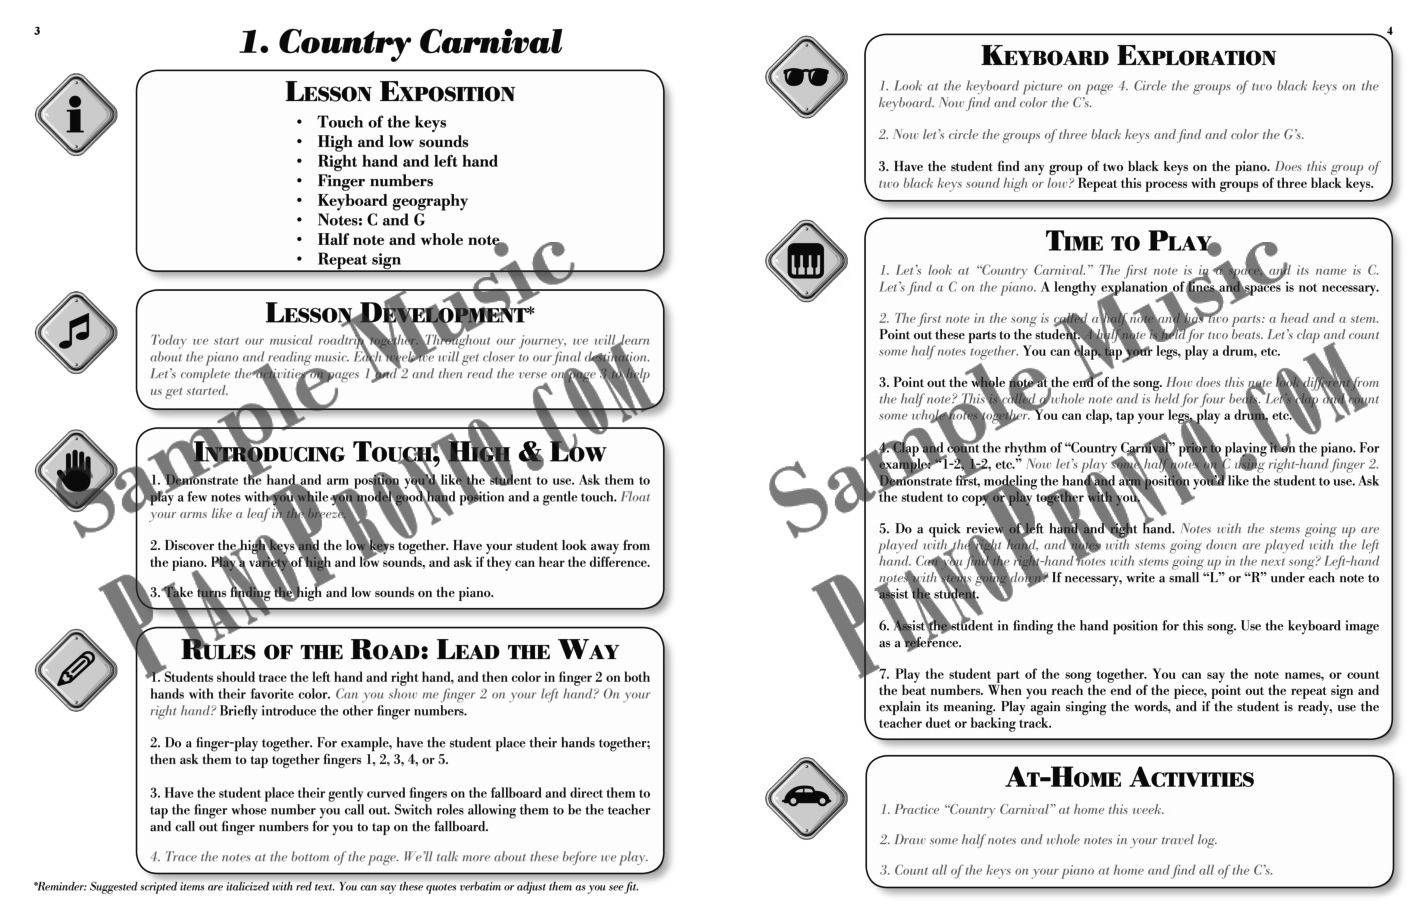 Roadtrip!® Country Carnival: Teacher Guidebook & Duets